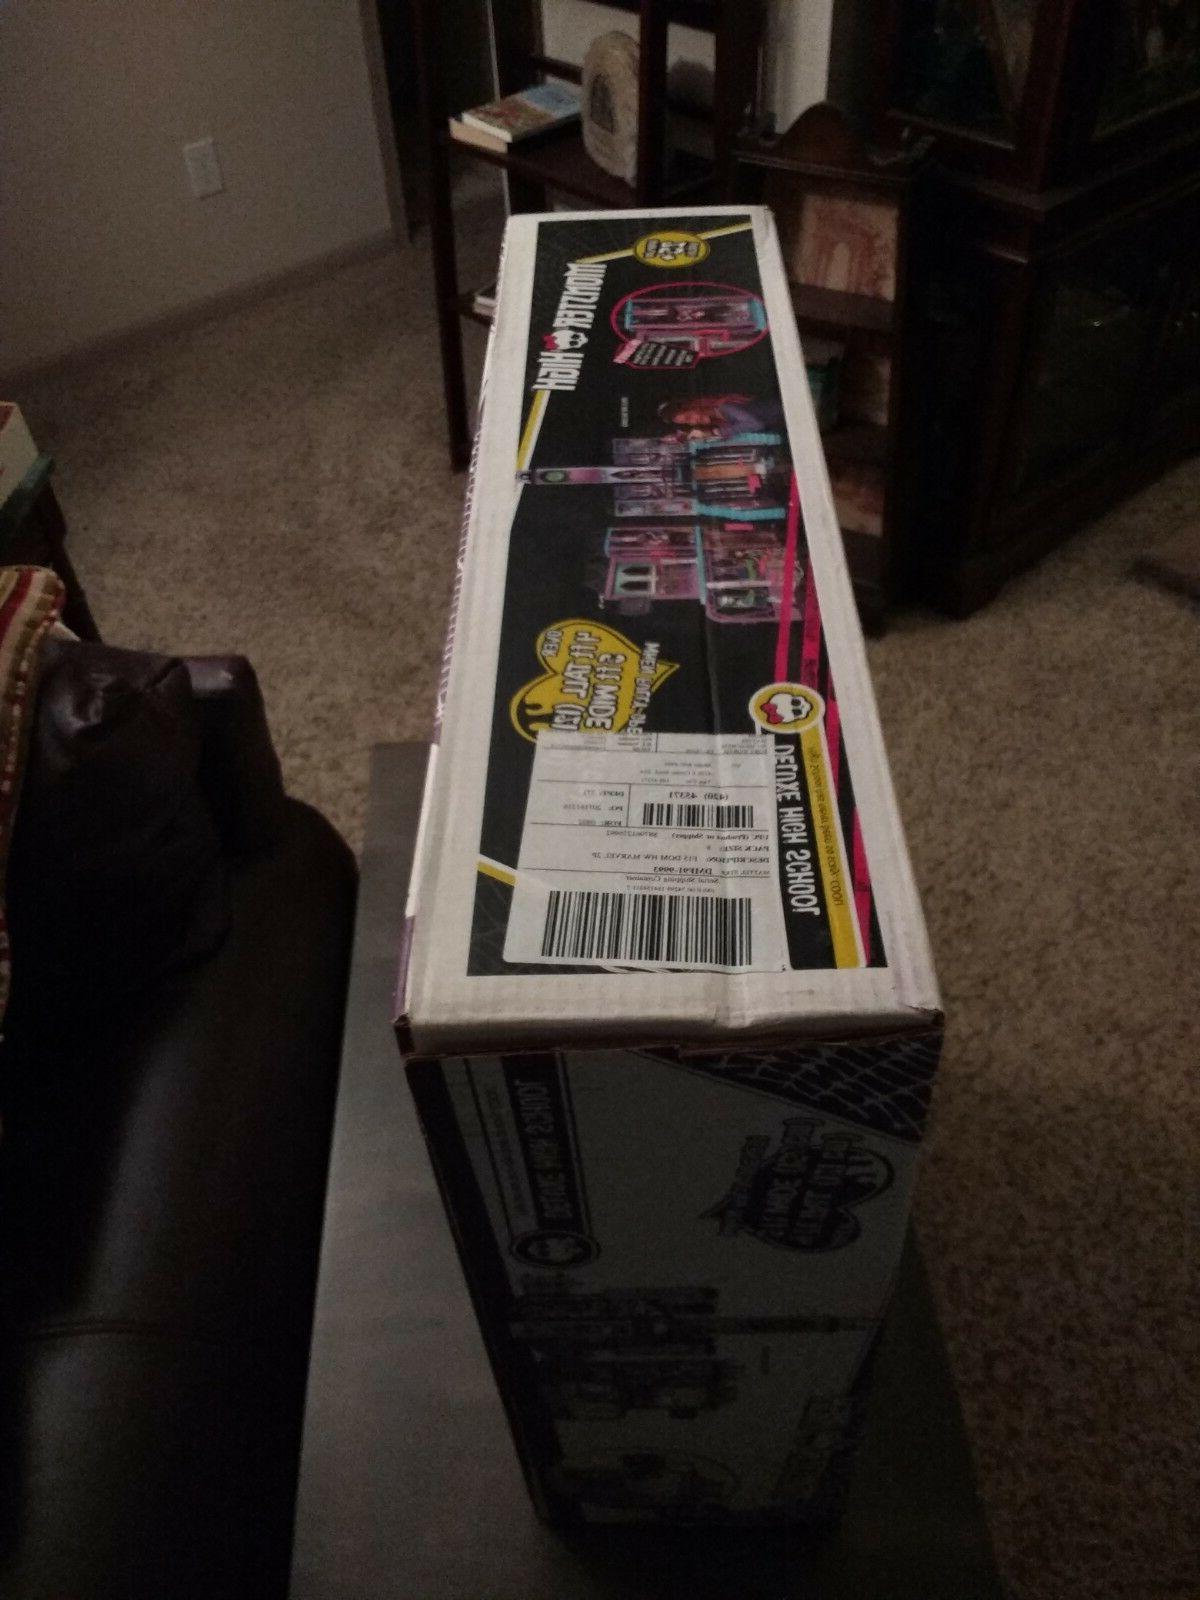 Mattel Monster Deluxe HS Playset Playhouse Deluxe Castle -